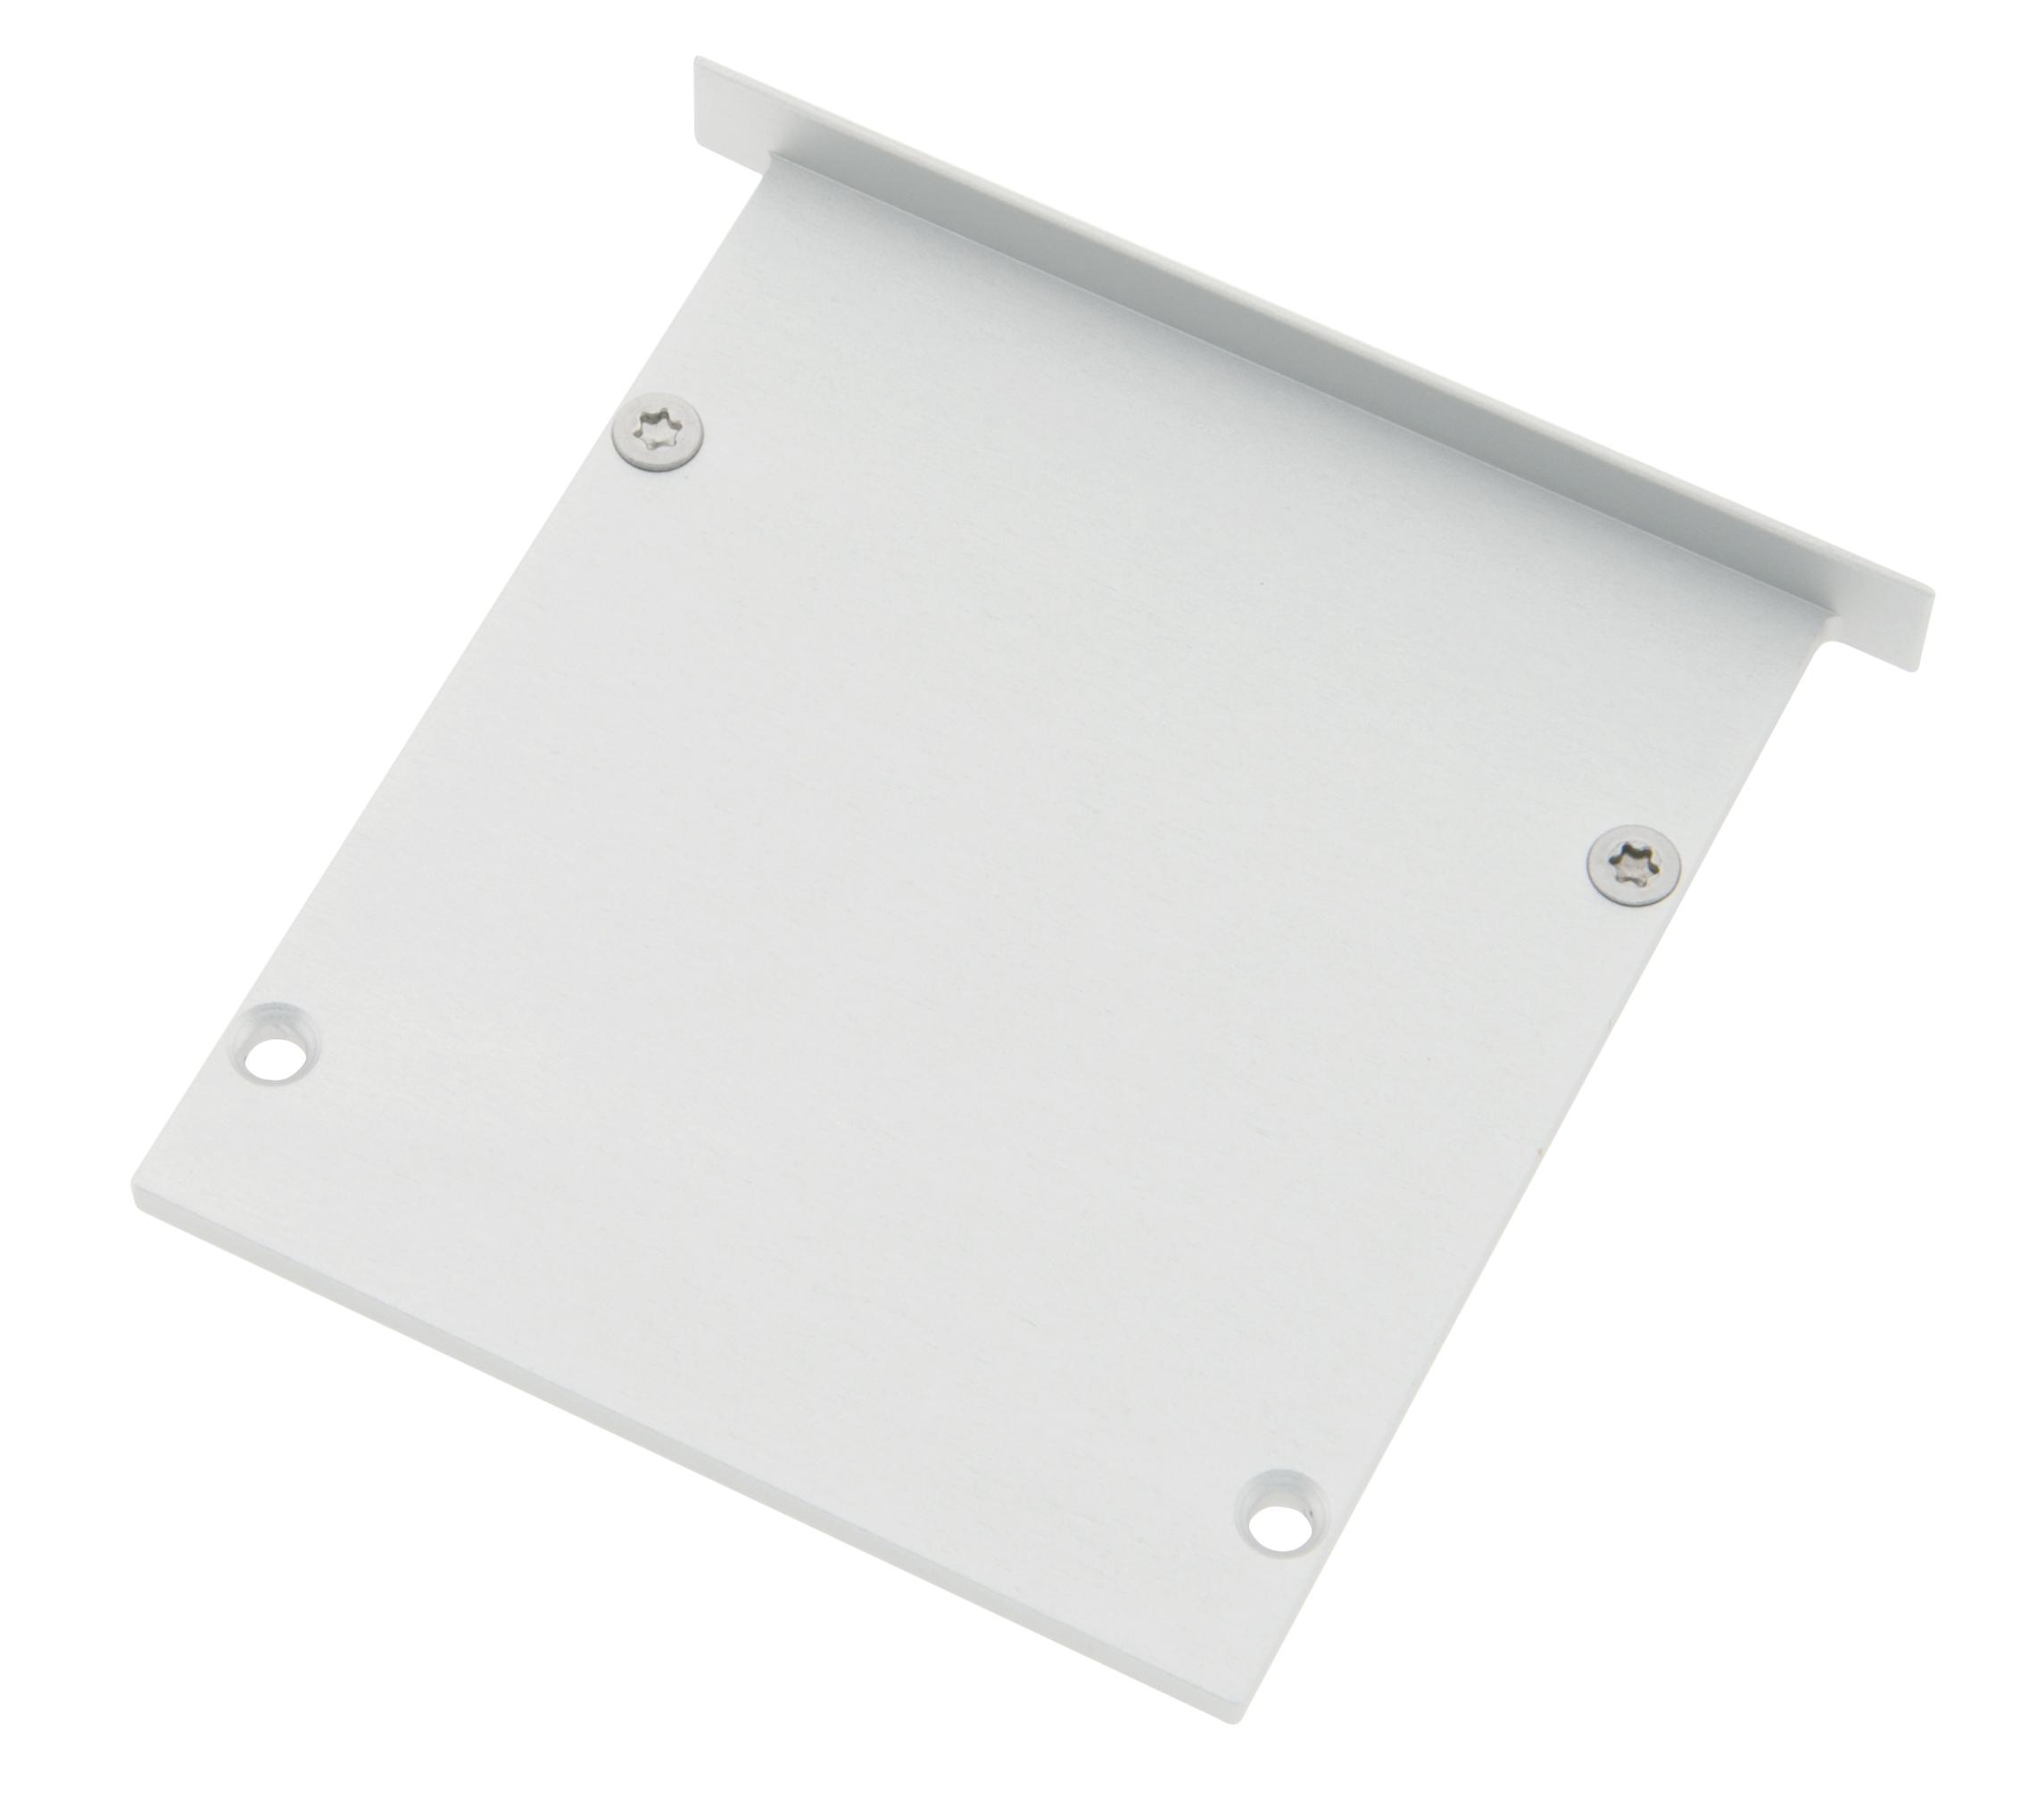 1 Stk Profil Endkappe SLT inkl. Schrauben LIEK003500